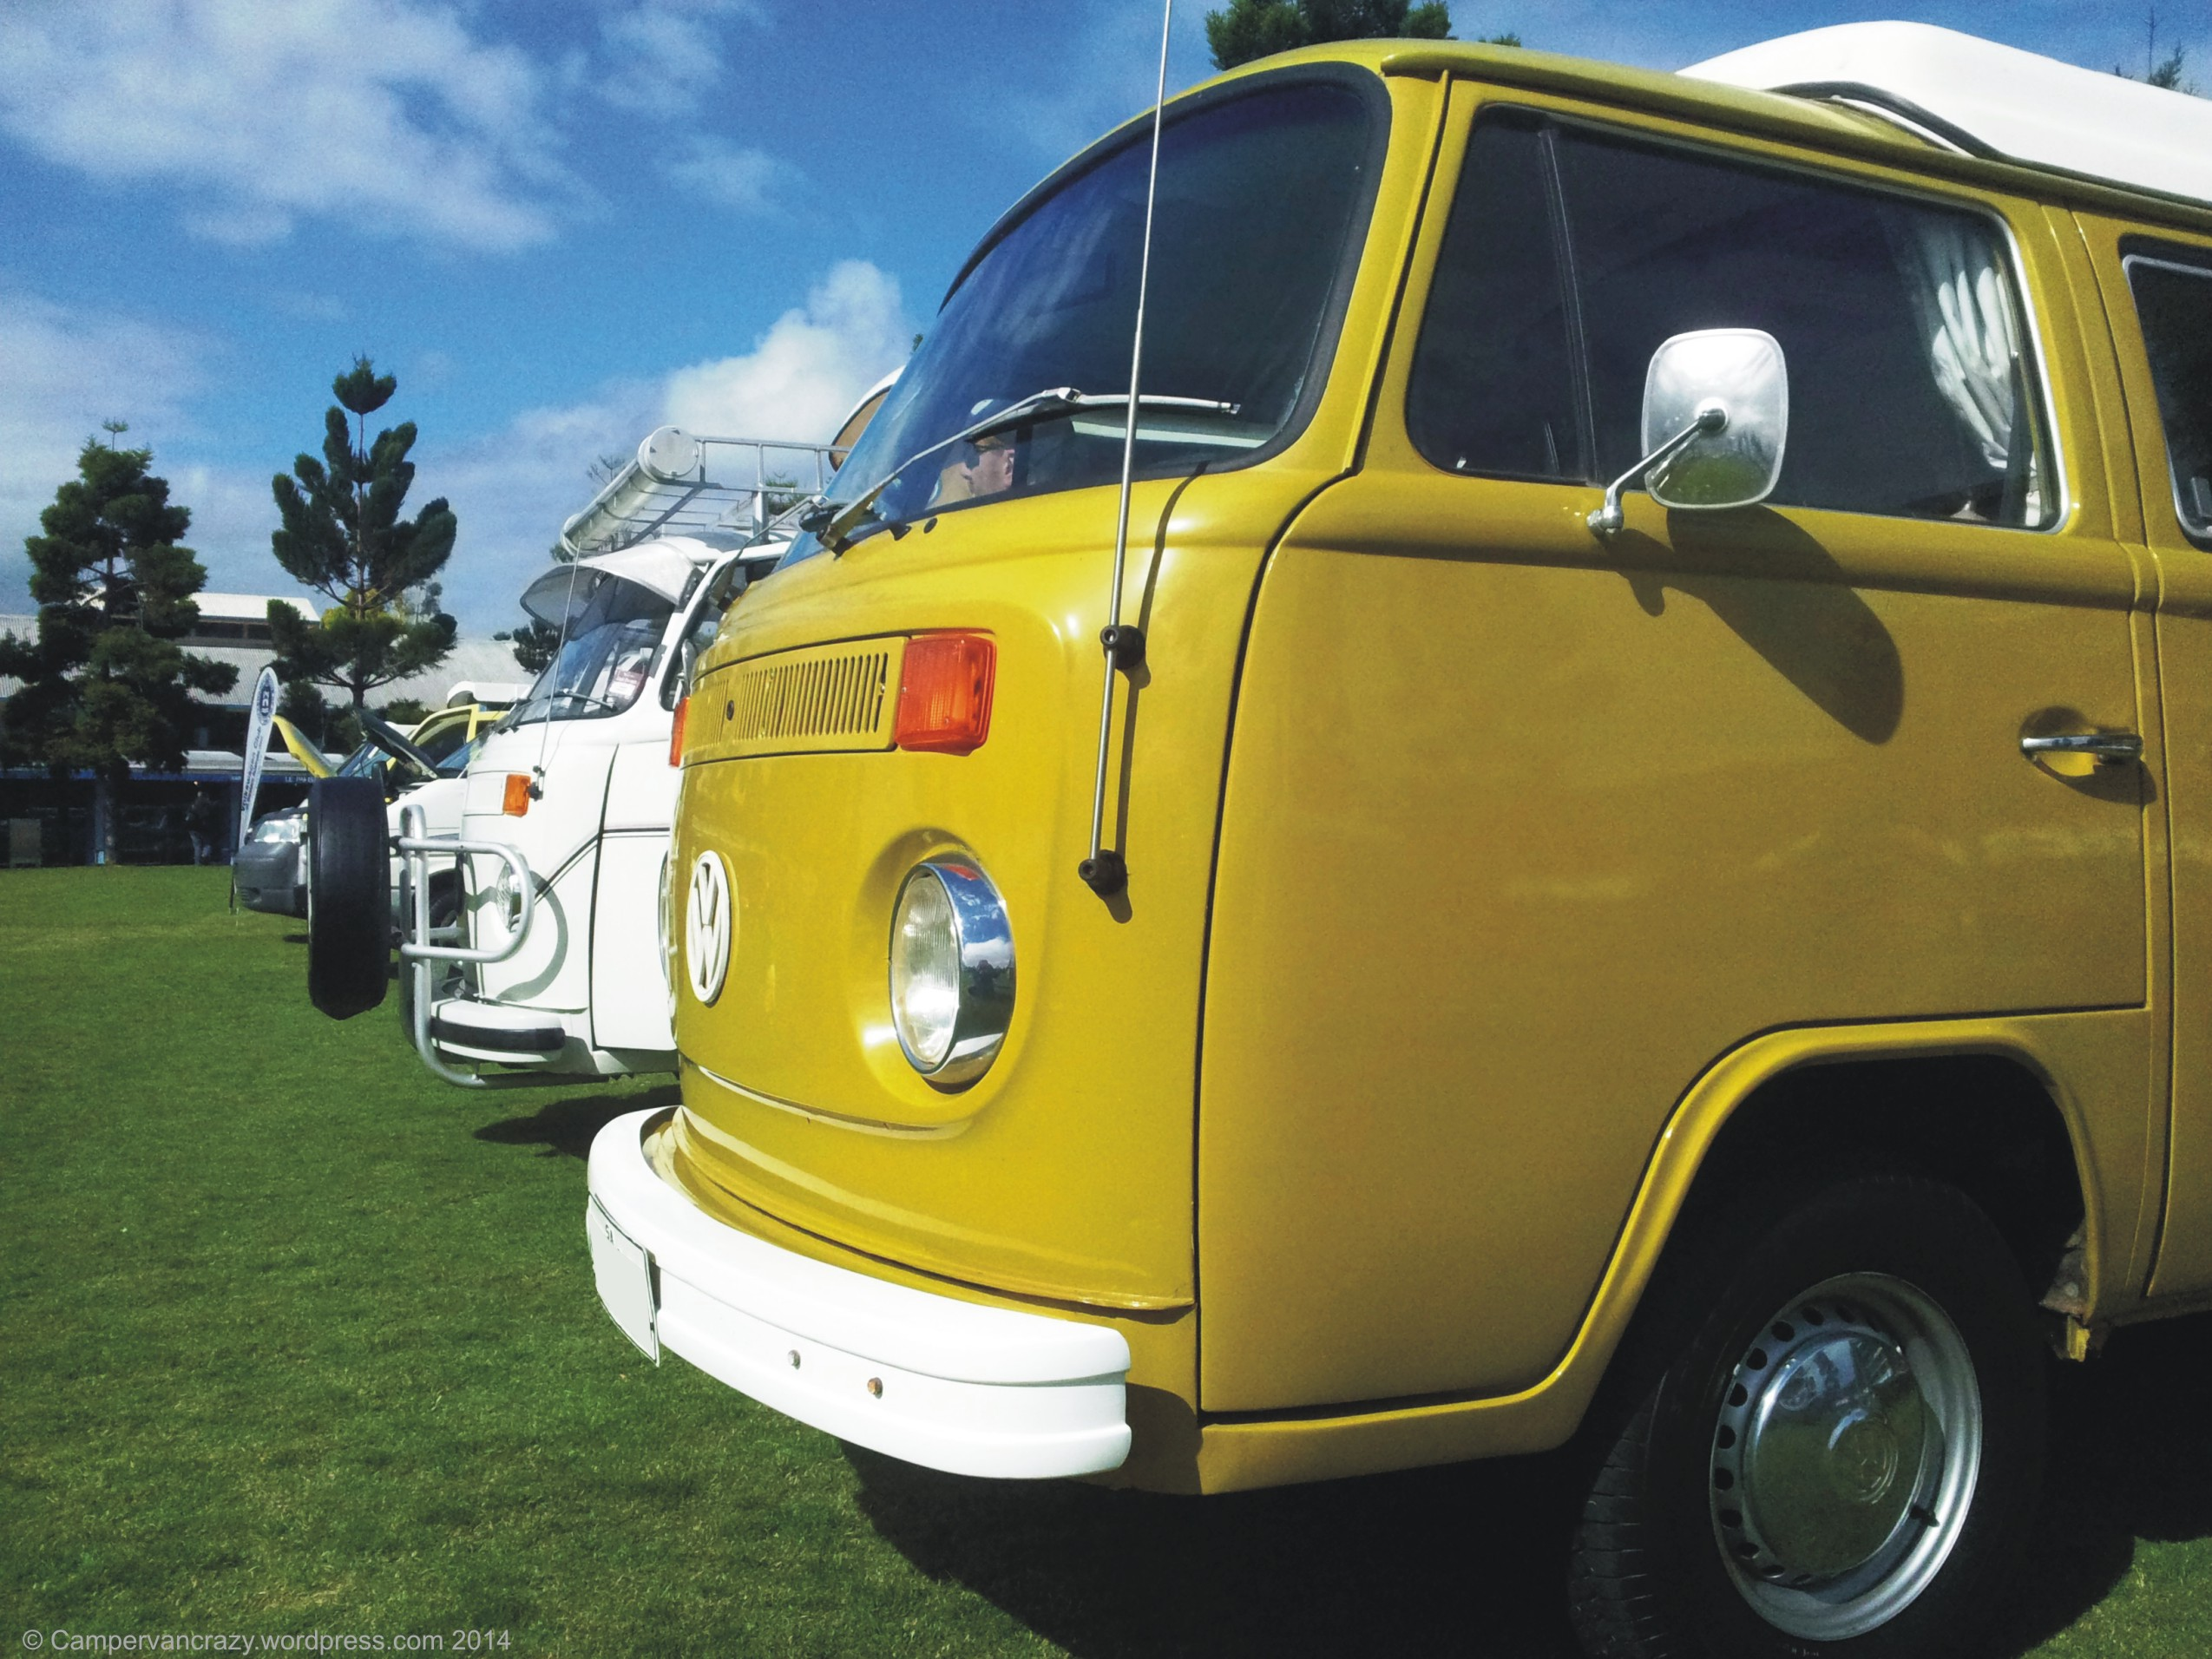 VW Bus Festivals | Campervan Crazy